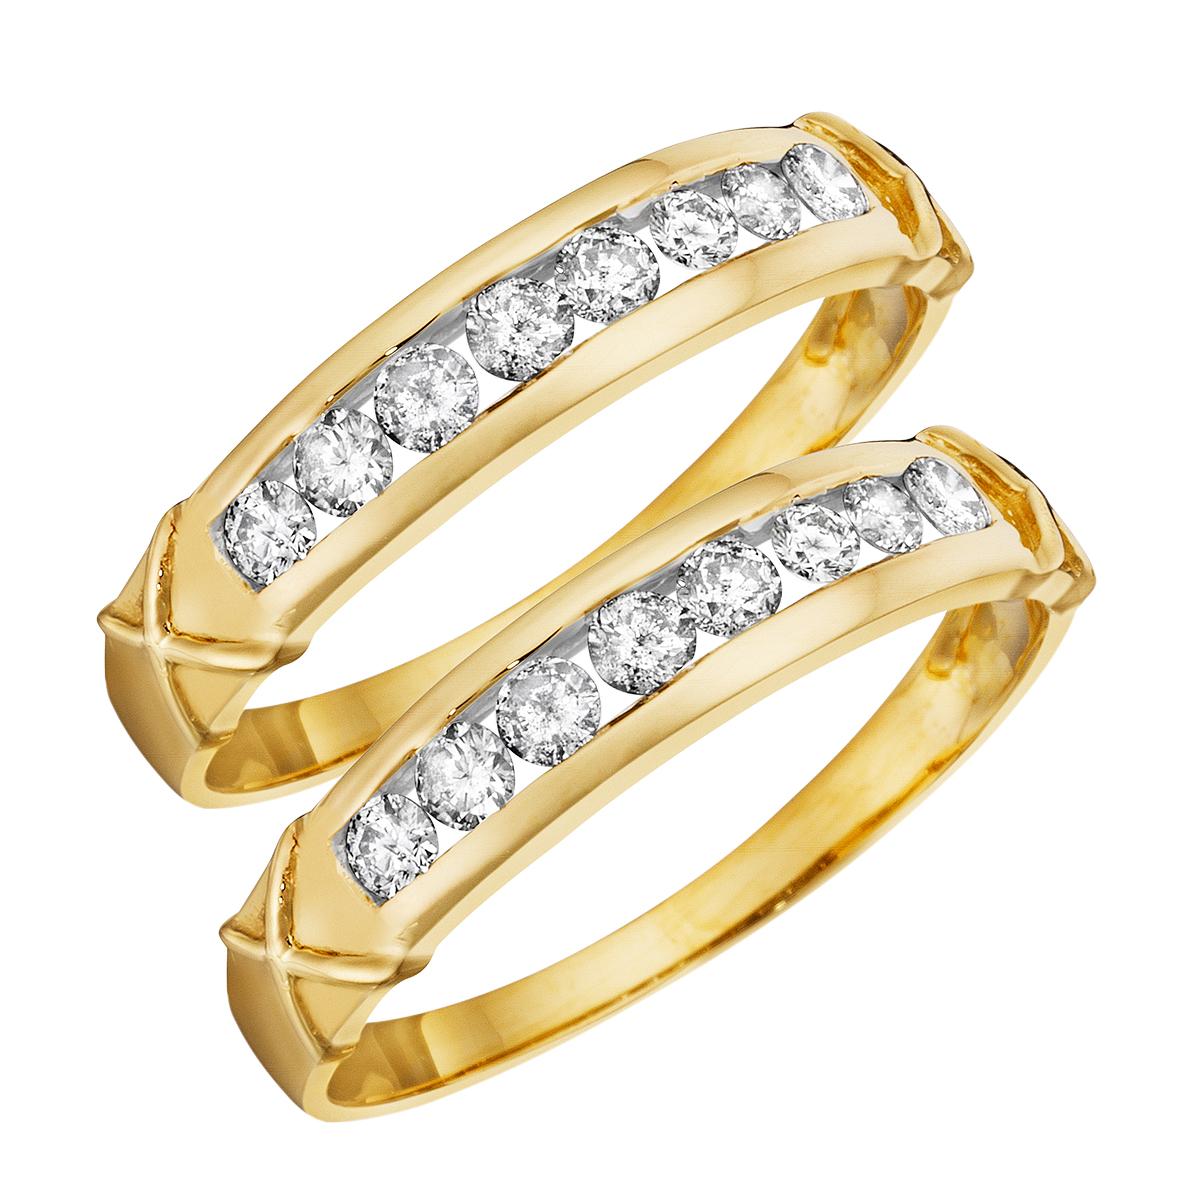 5/8 CT. T.W. Round Cut Ladies Same Sex Wedding Band Set 14K Yellow Gold- Size 8